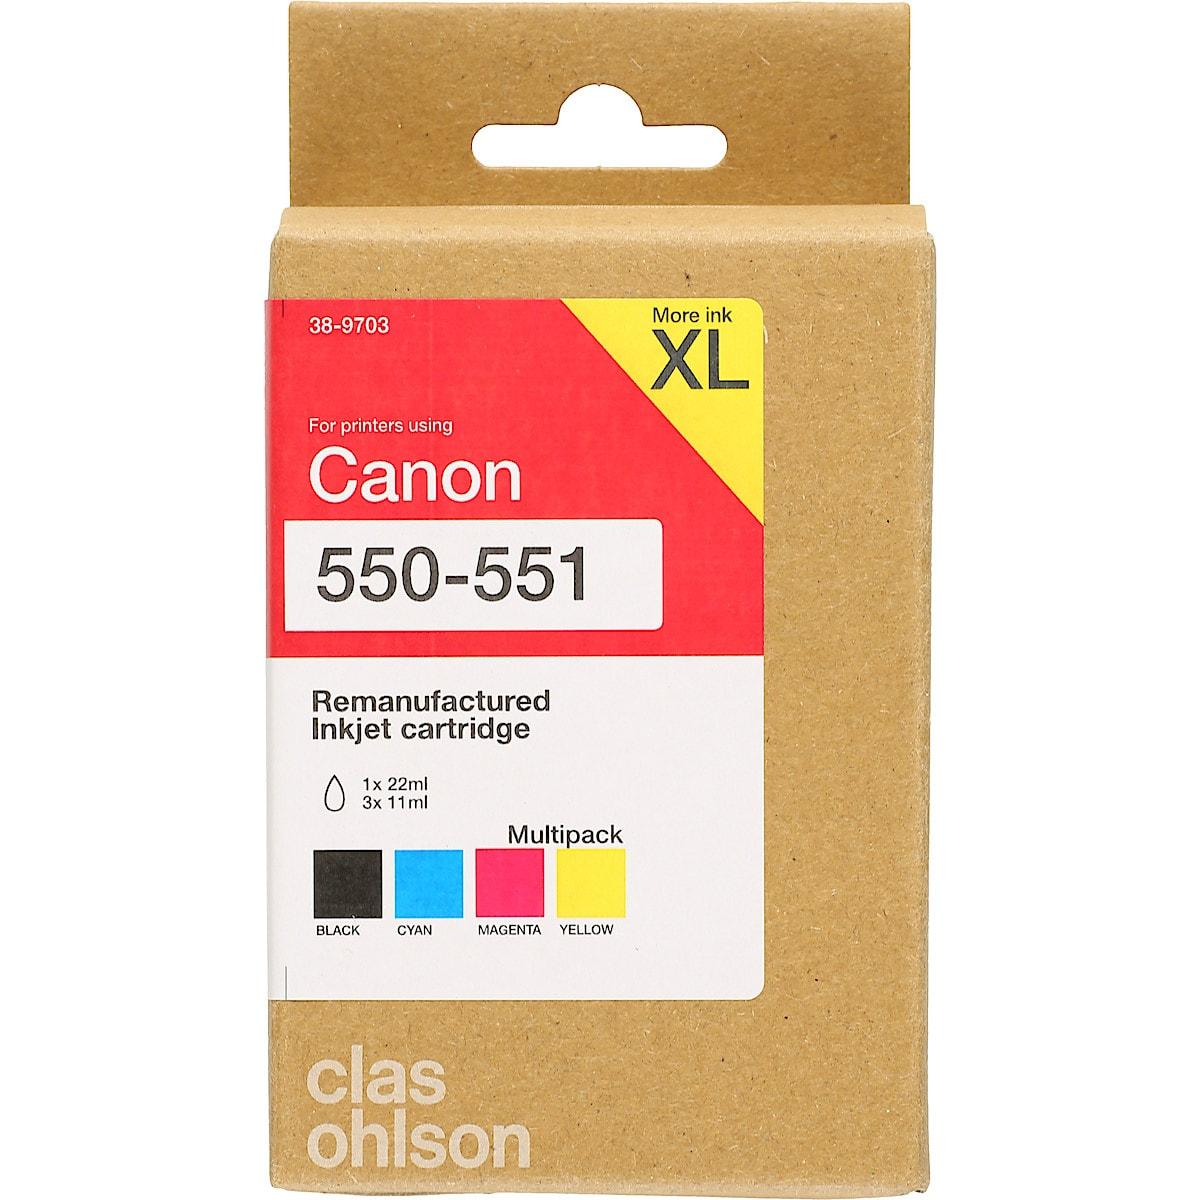 Clas Ohlson blekkpatron multipack XL til Canon PGI-550 / CLI-551